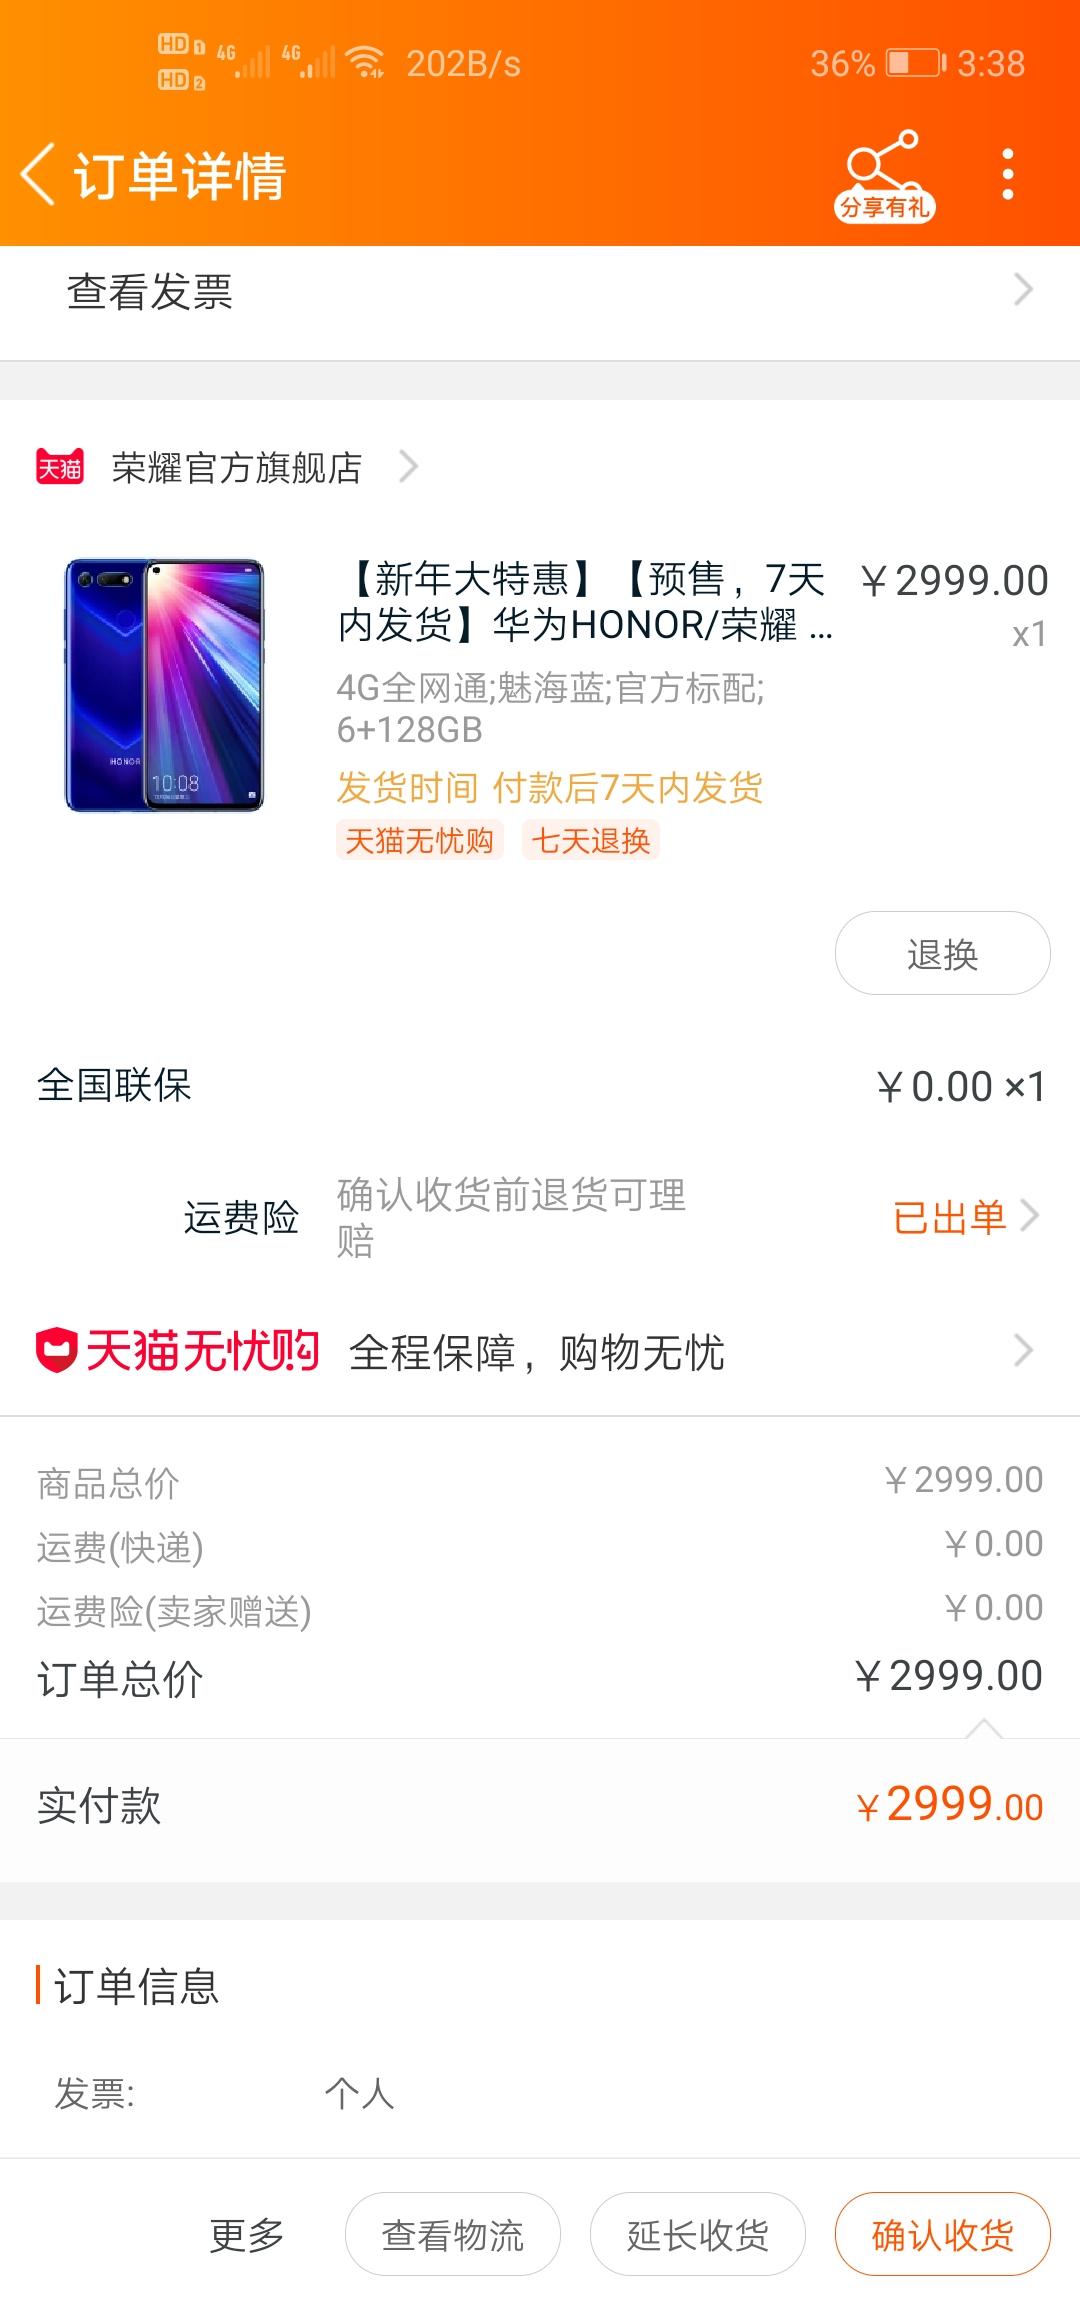 Screenshot_20190127_153844_com.taobao.taobao.jpg